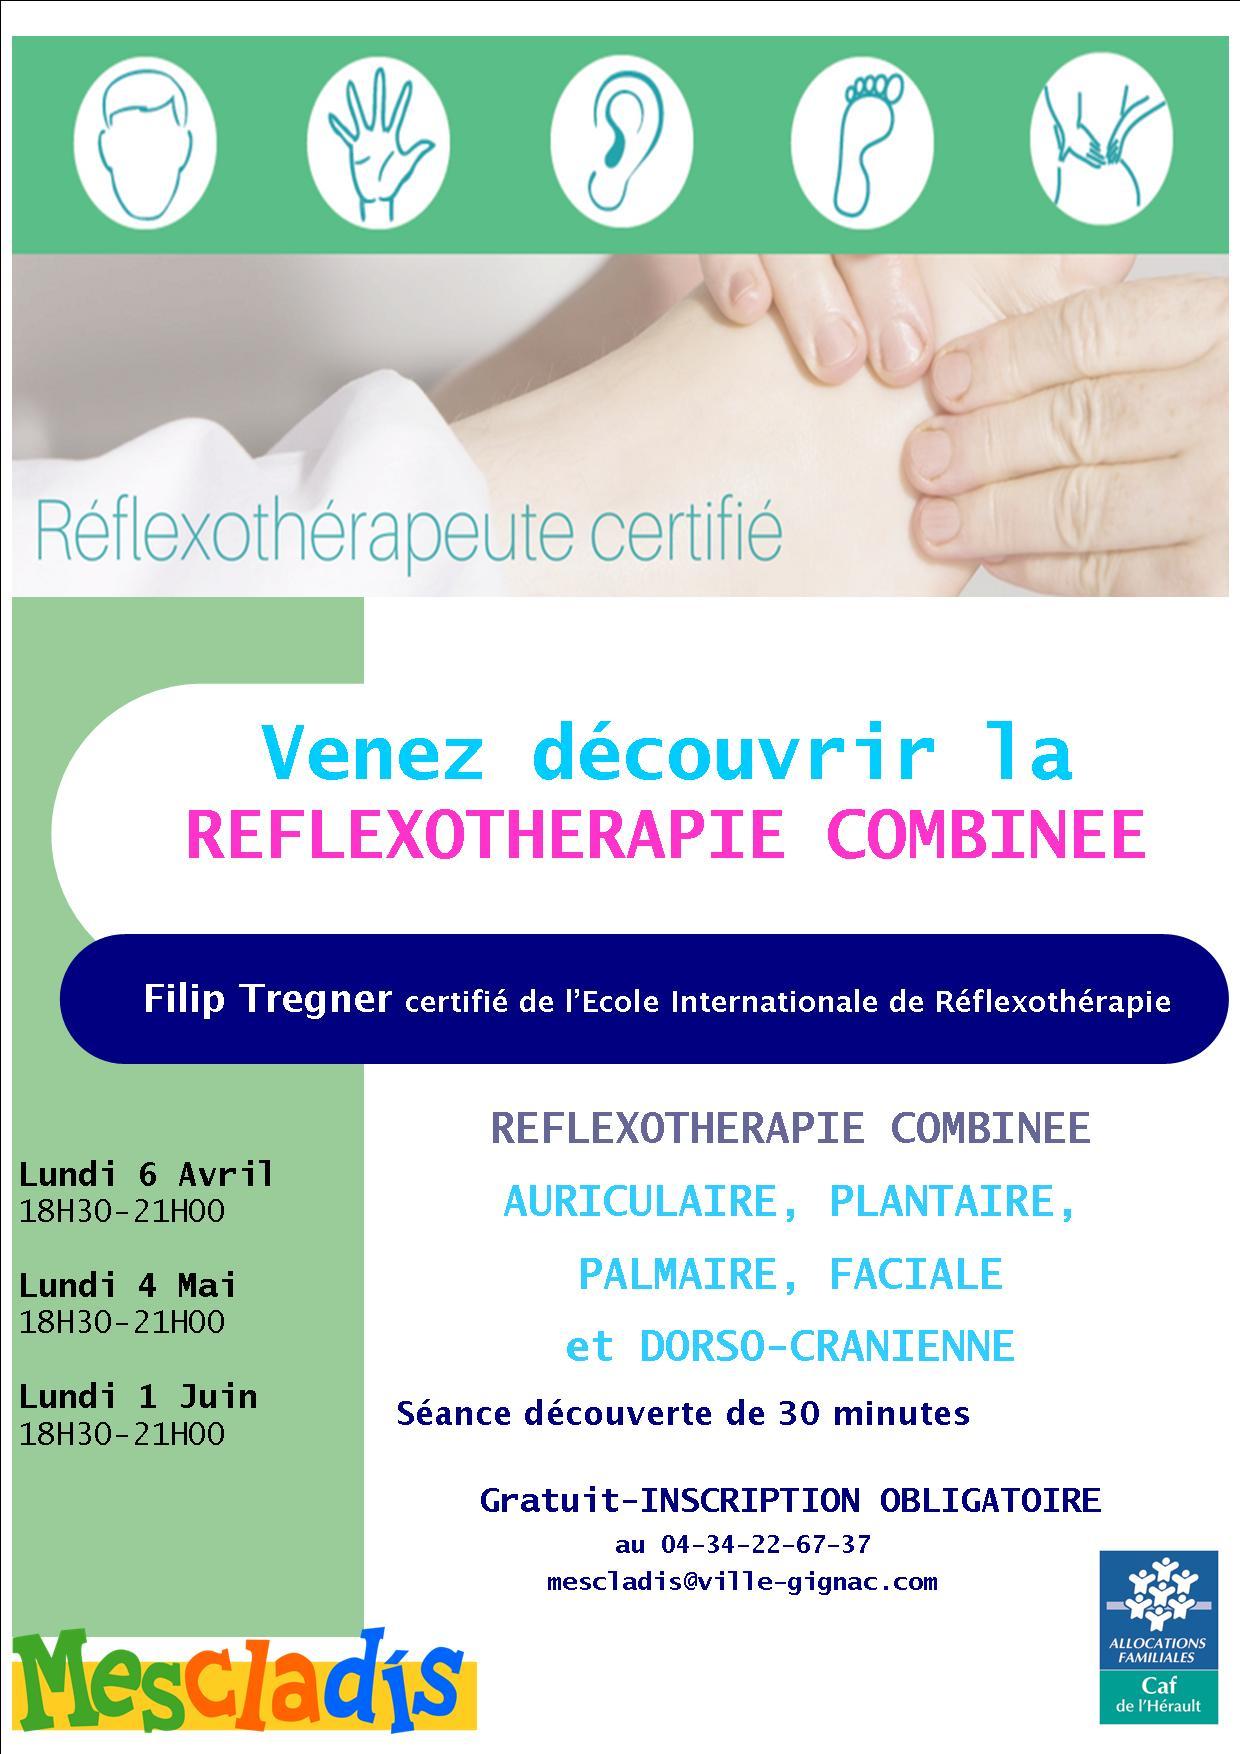 atelier reflexo therapie